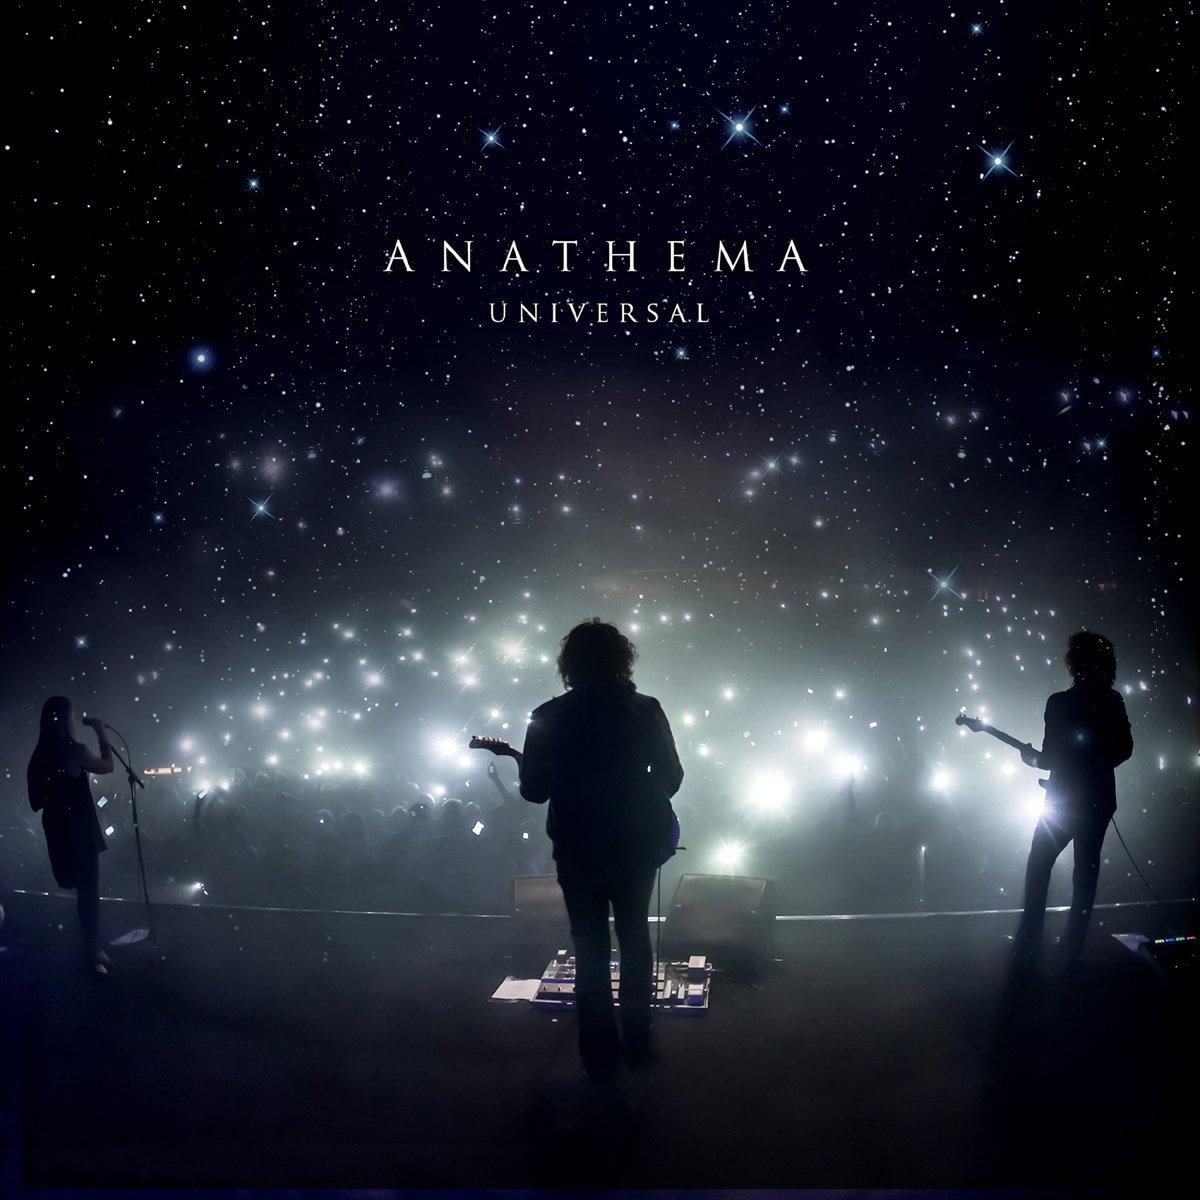 Anathema2a.jpg